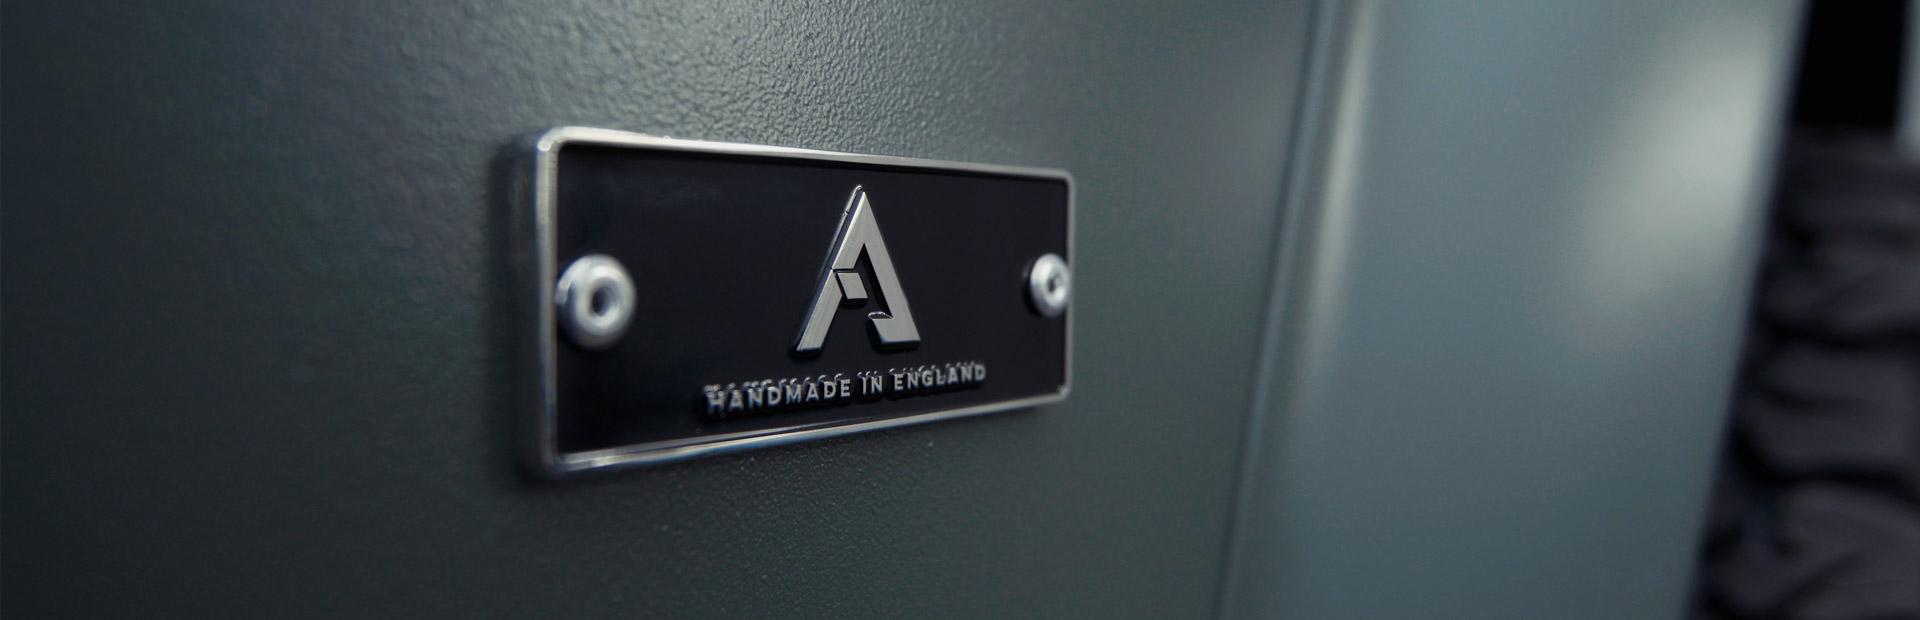 Arkonik Fortitude - Custom built Land Rover Defender 110